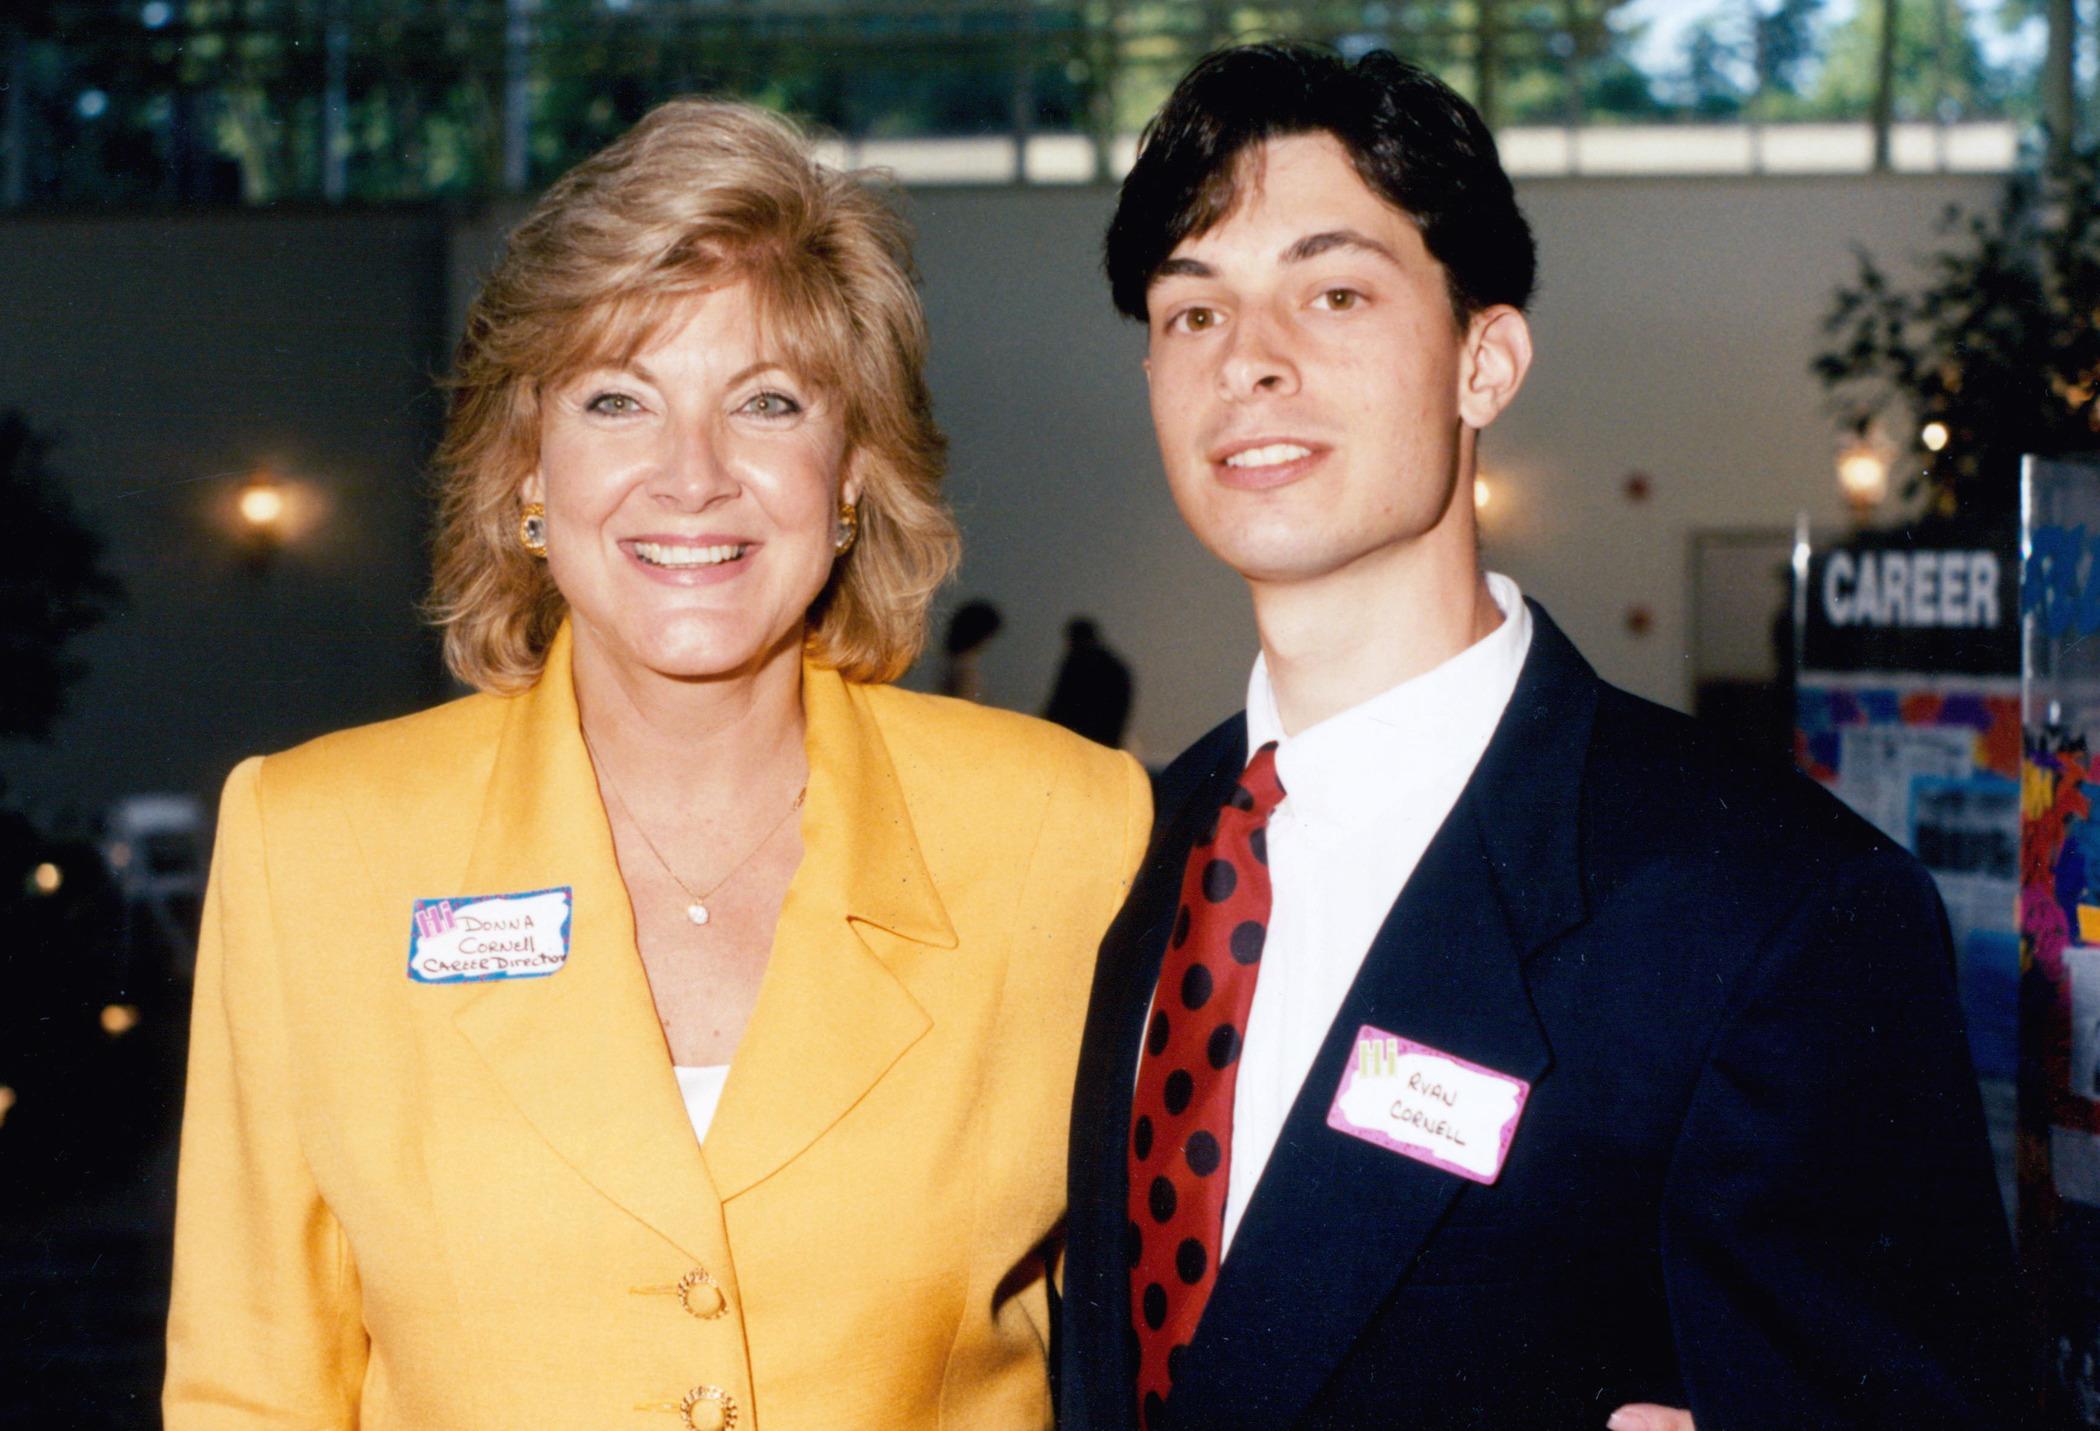 Donna Cornell, Chairperson